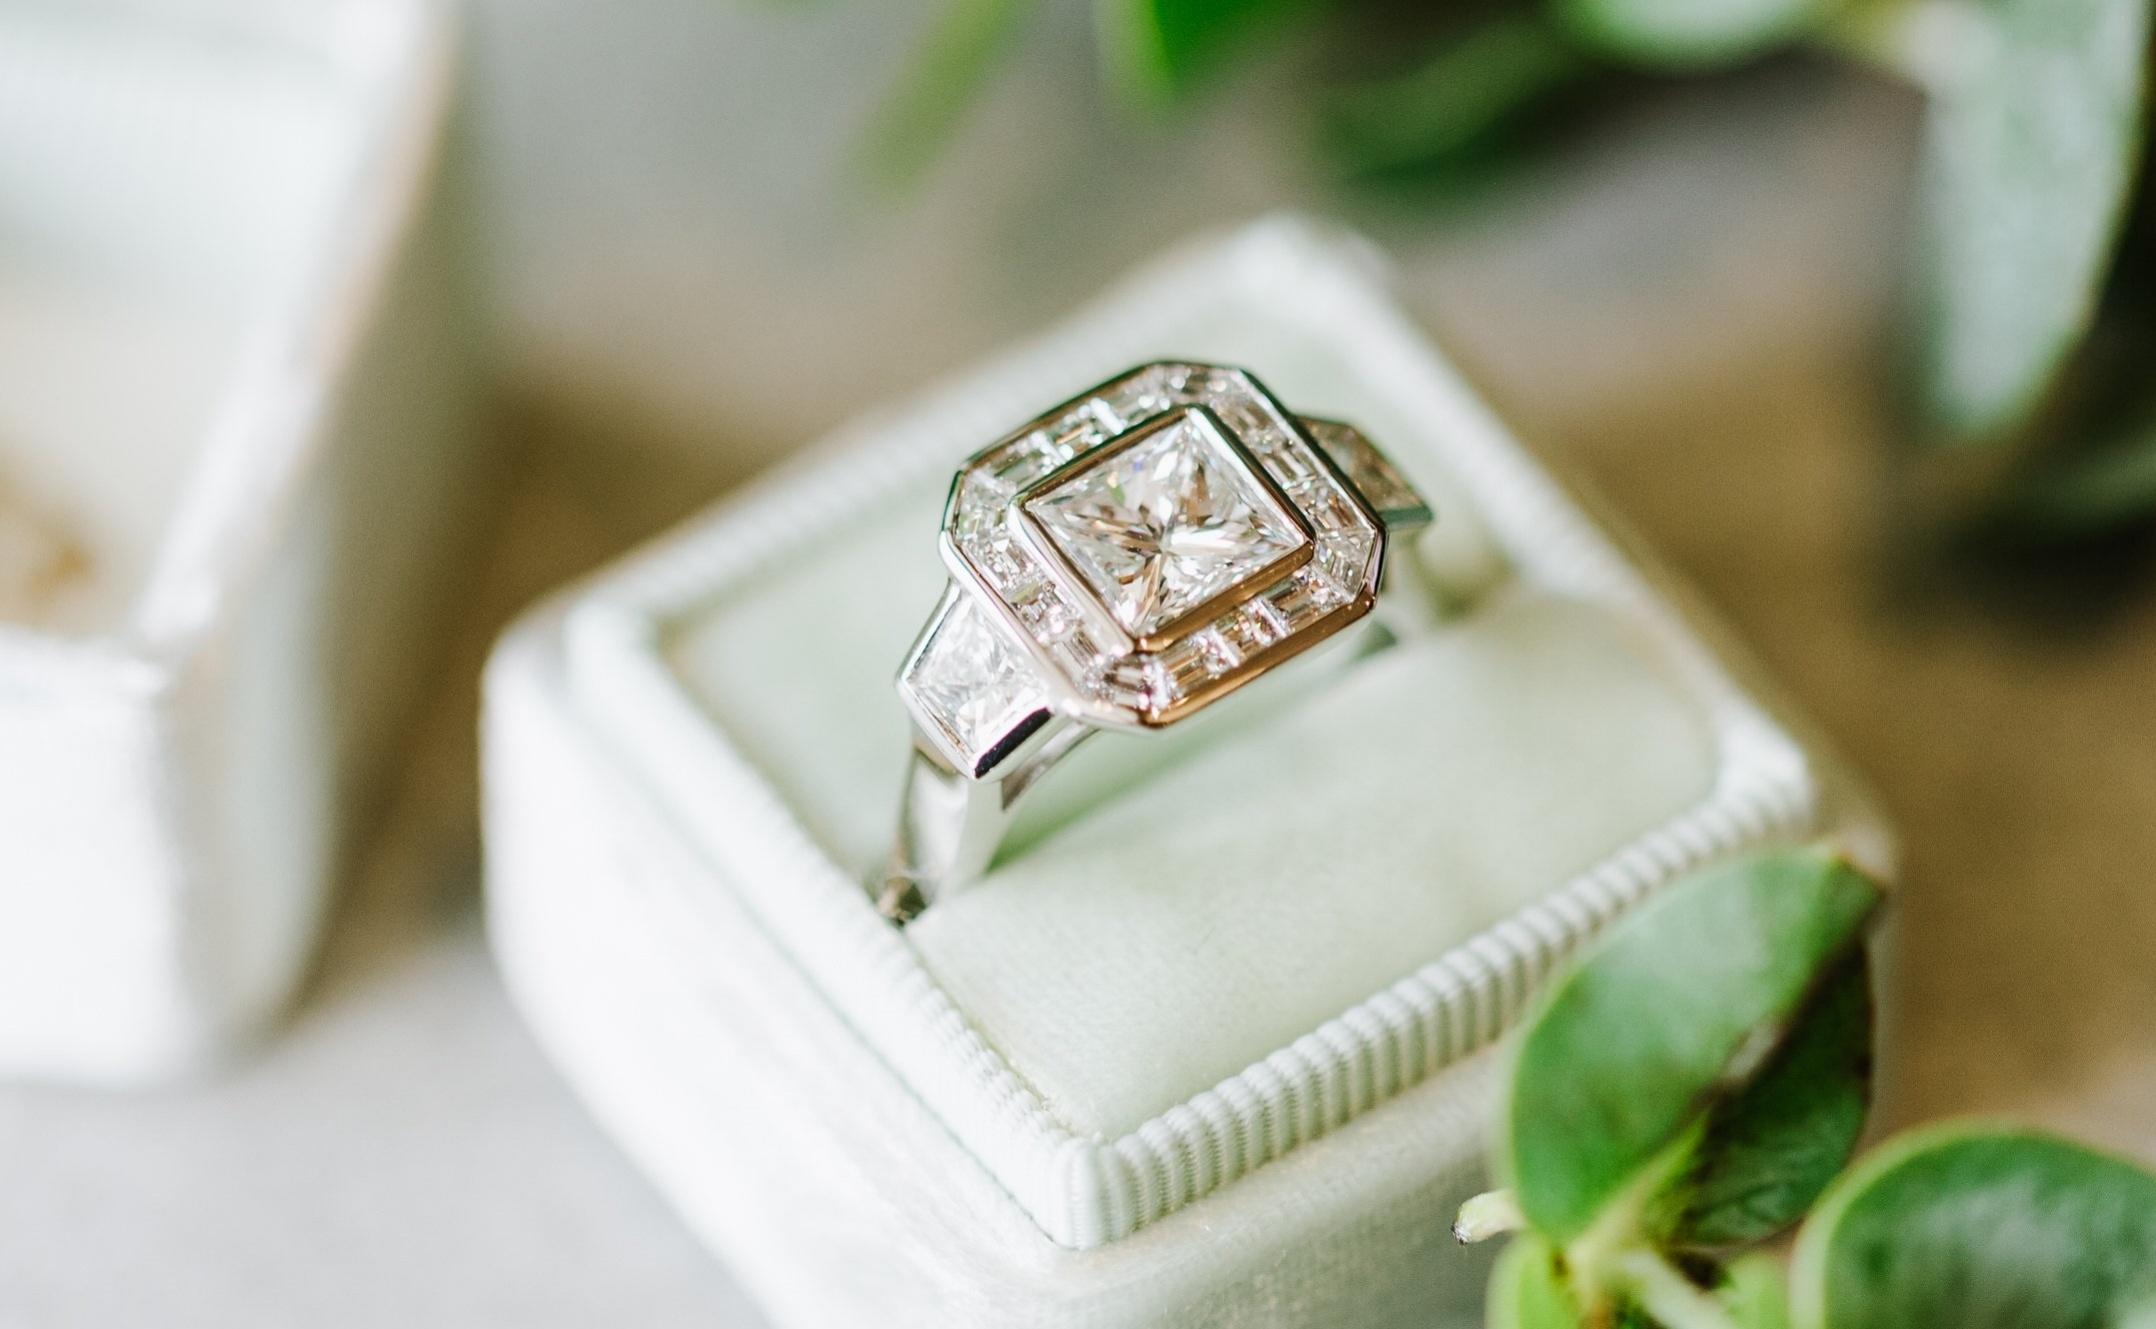 Add a diamond halo around the center diamond